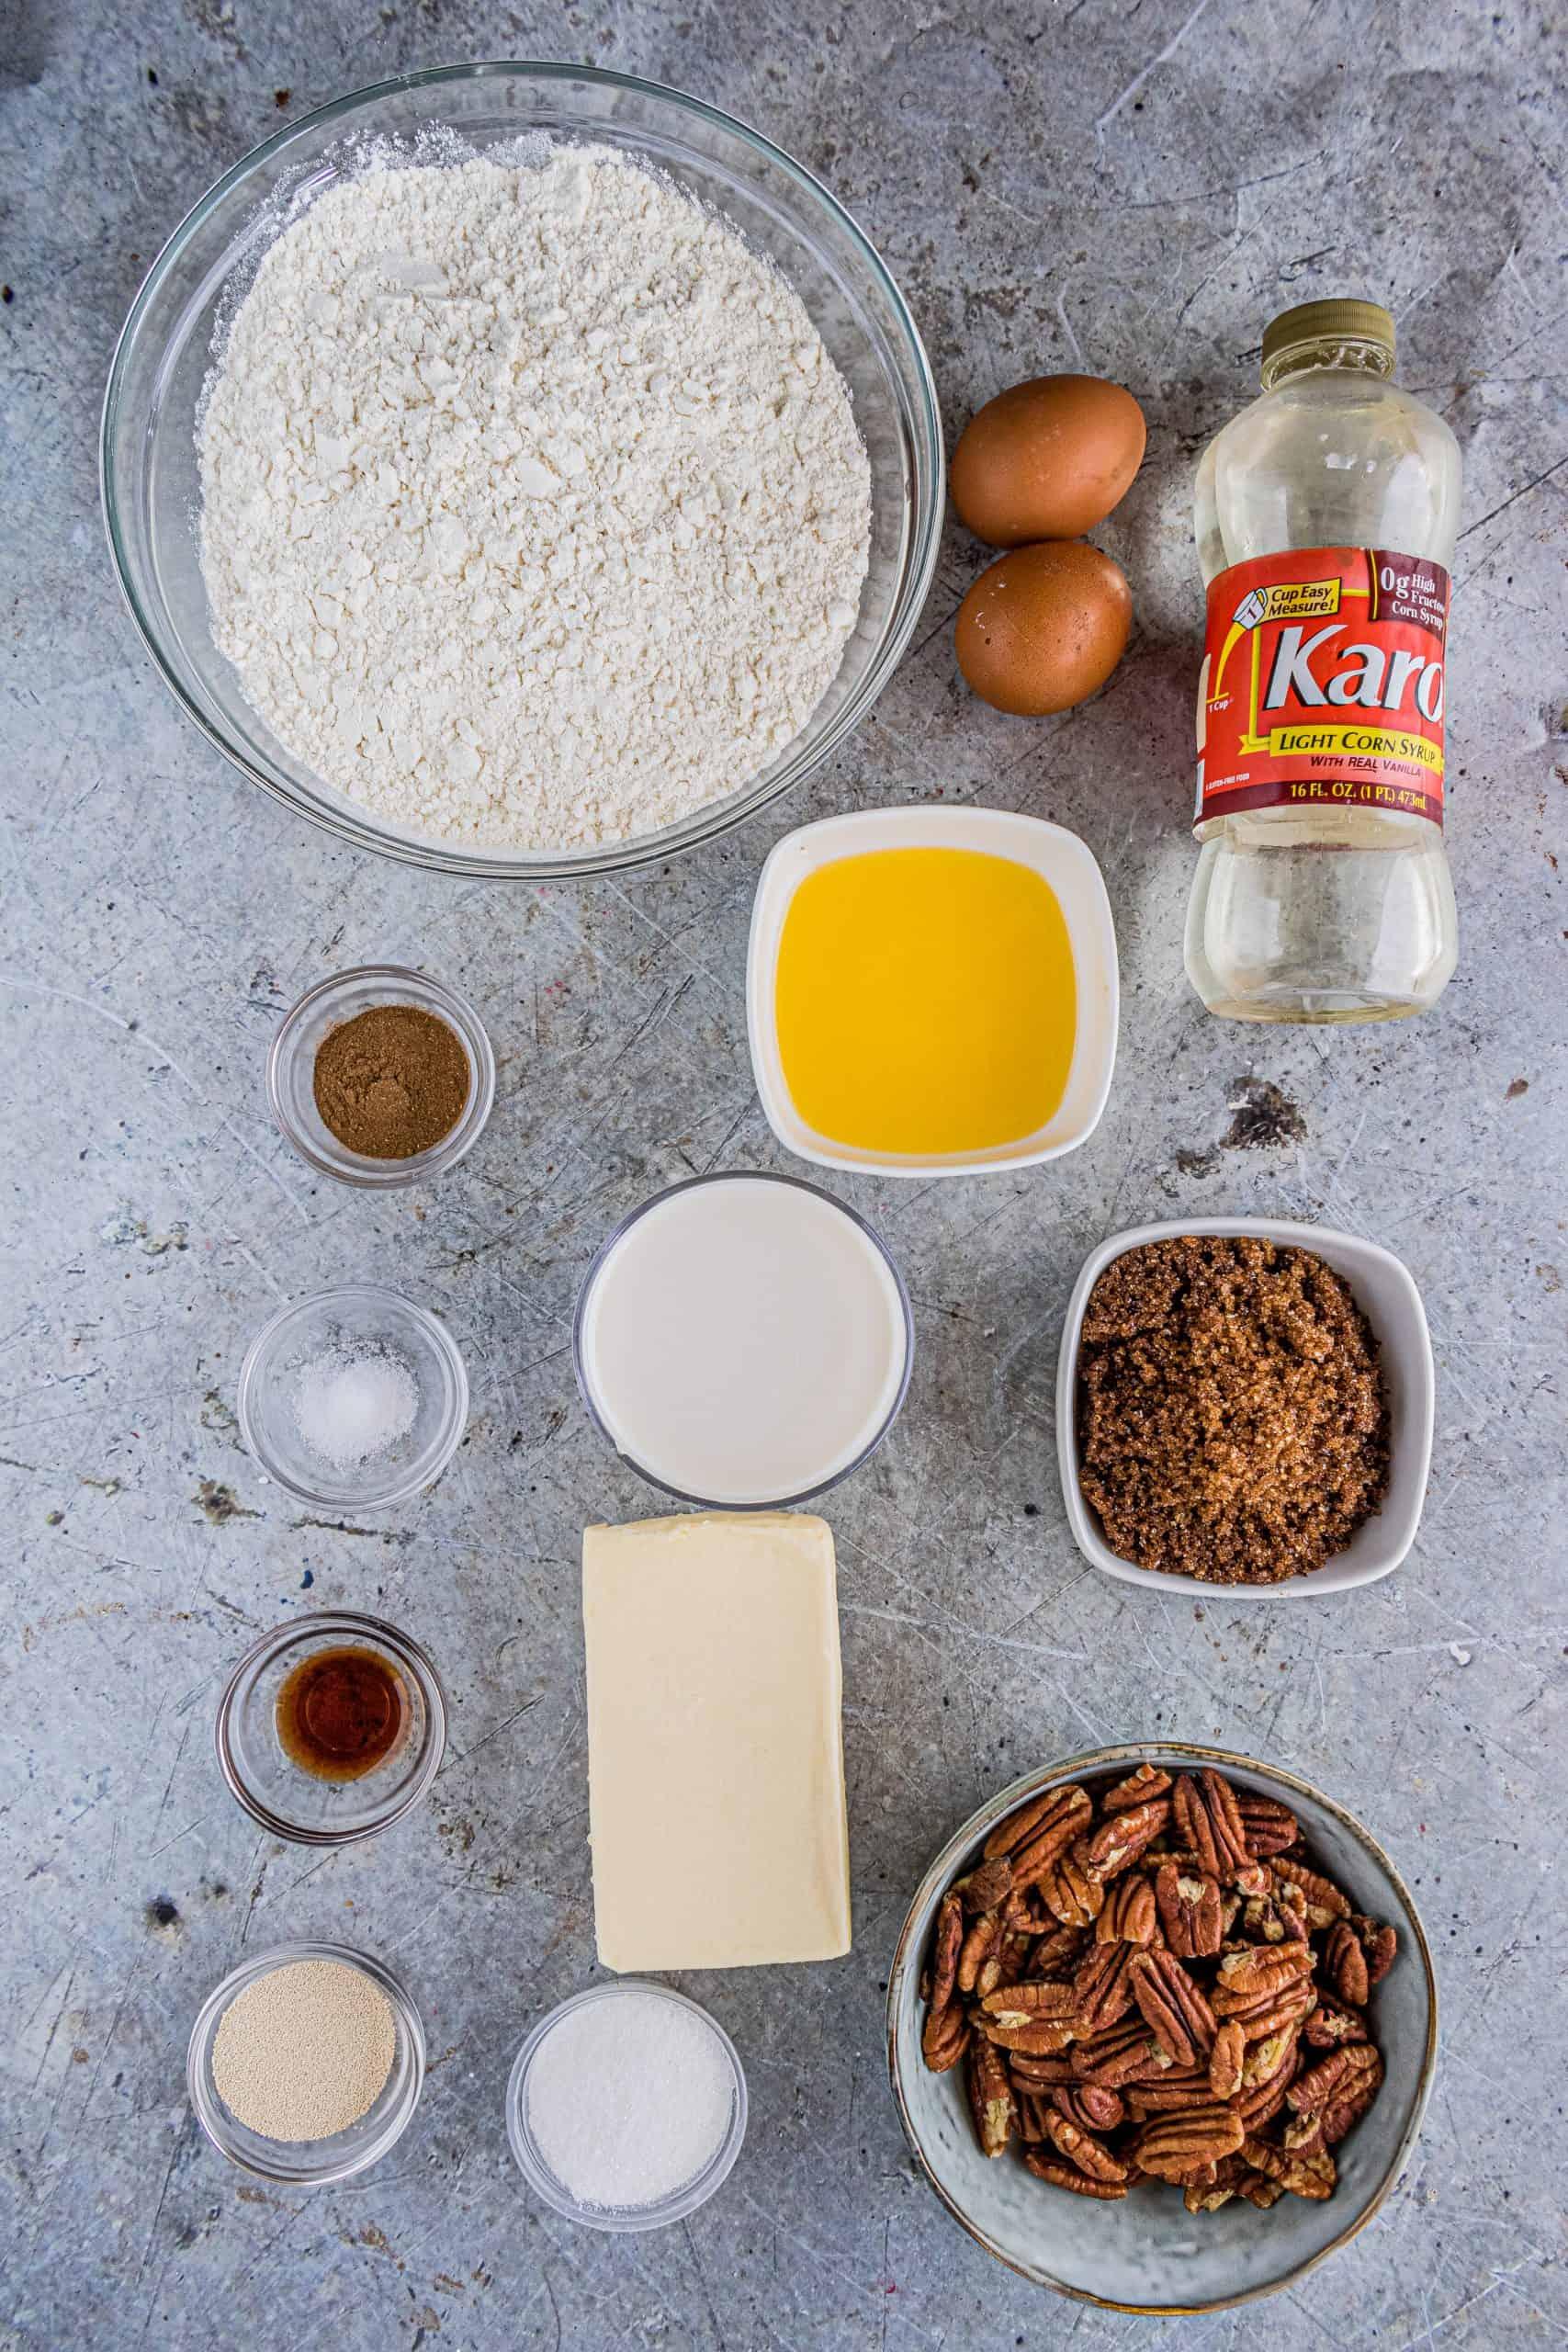 milk, instant active dry yeast, granulated sugar, all-purpose flour, light corn syrup, egg, vanilla extract, pecans, butter, dark brown sugar, cinnamon